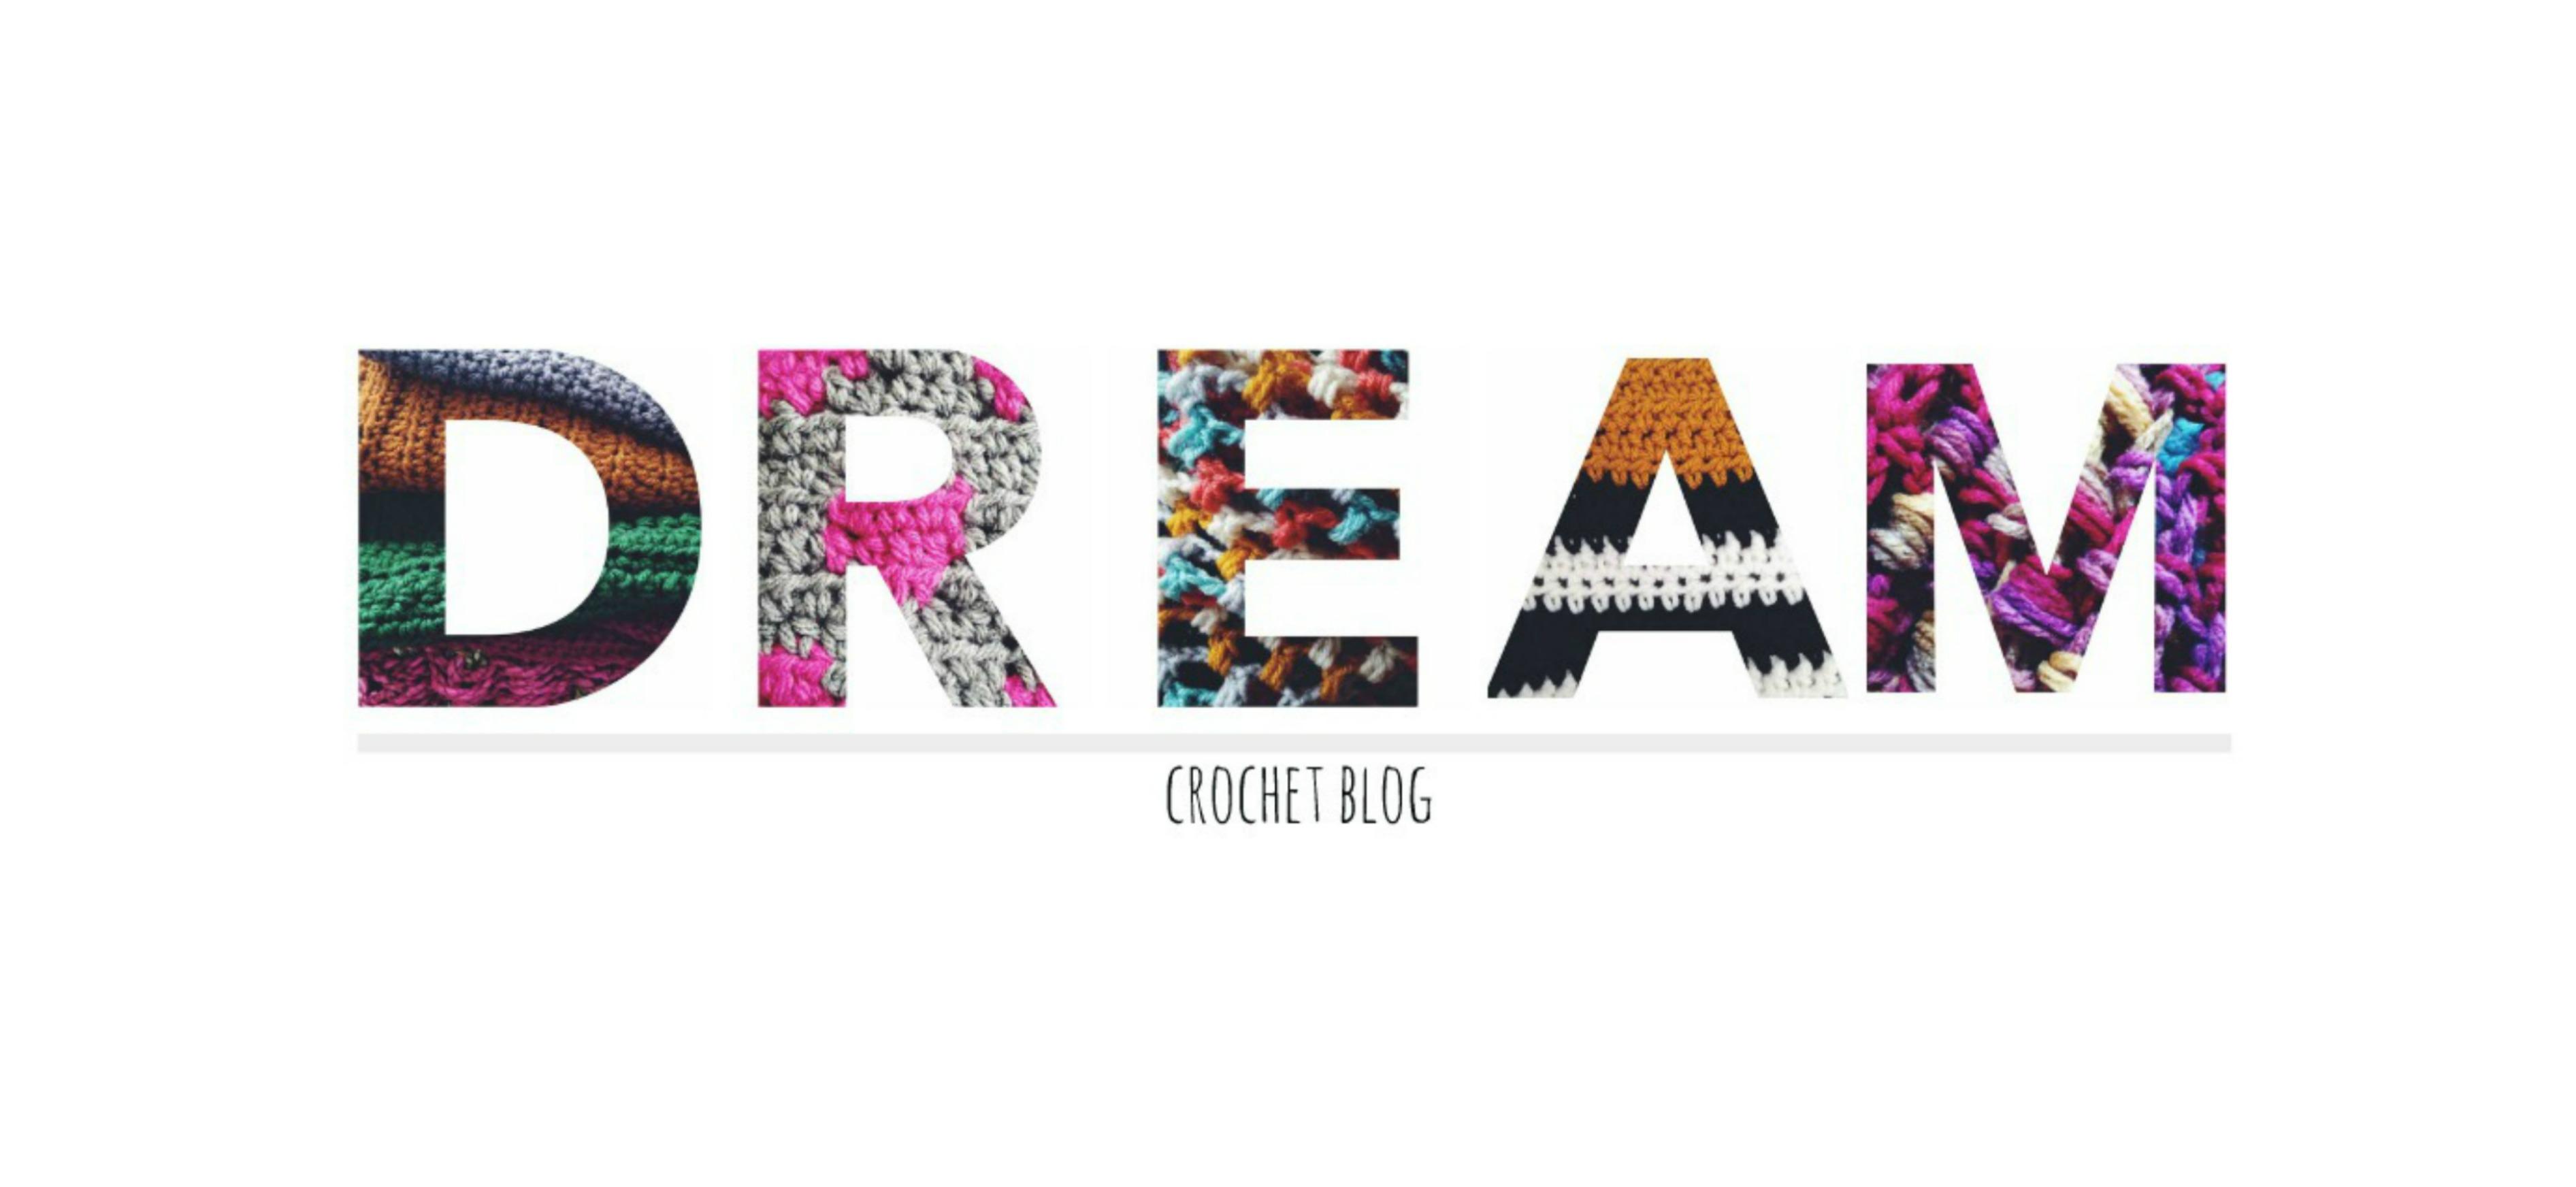 The Dream Crochet Blog. - Dream PNG